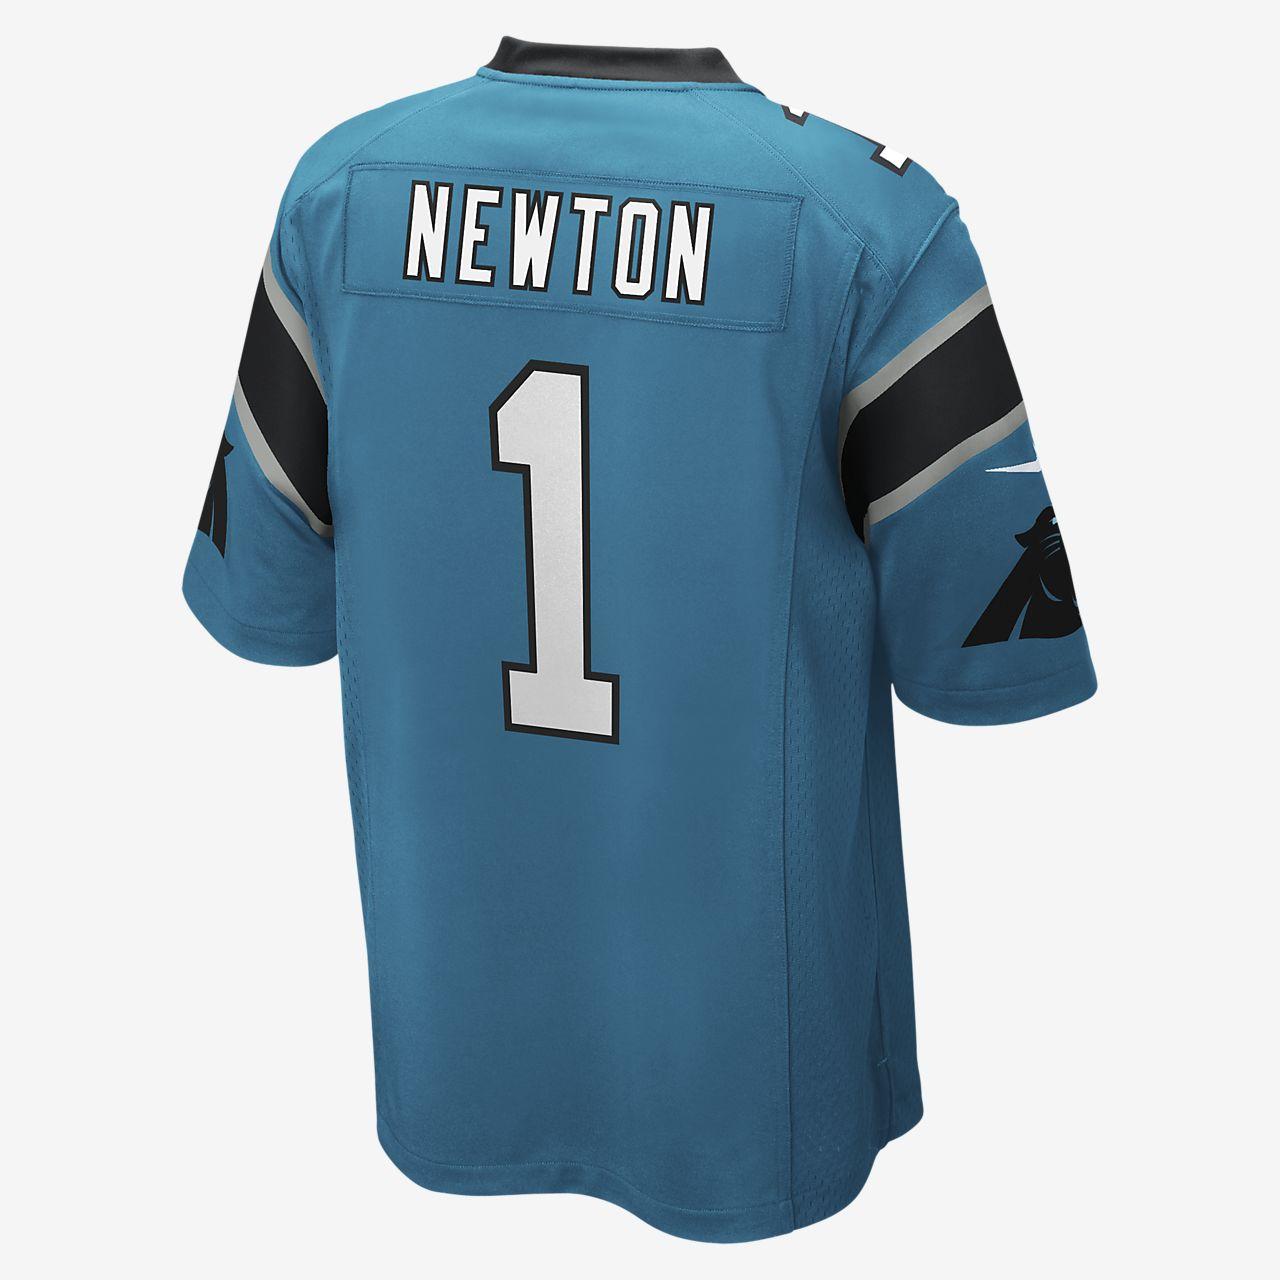 quality design e1388 fa48a NFL Carolina Panthers (Cam Newton) Men's Game Football Jersey